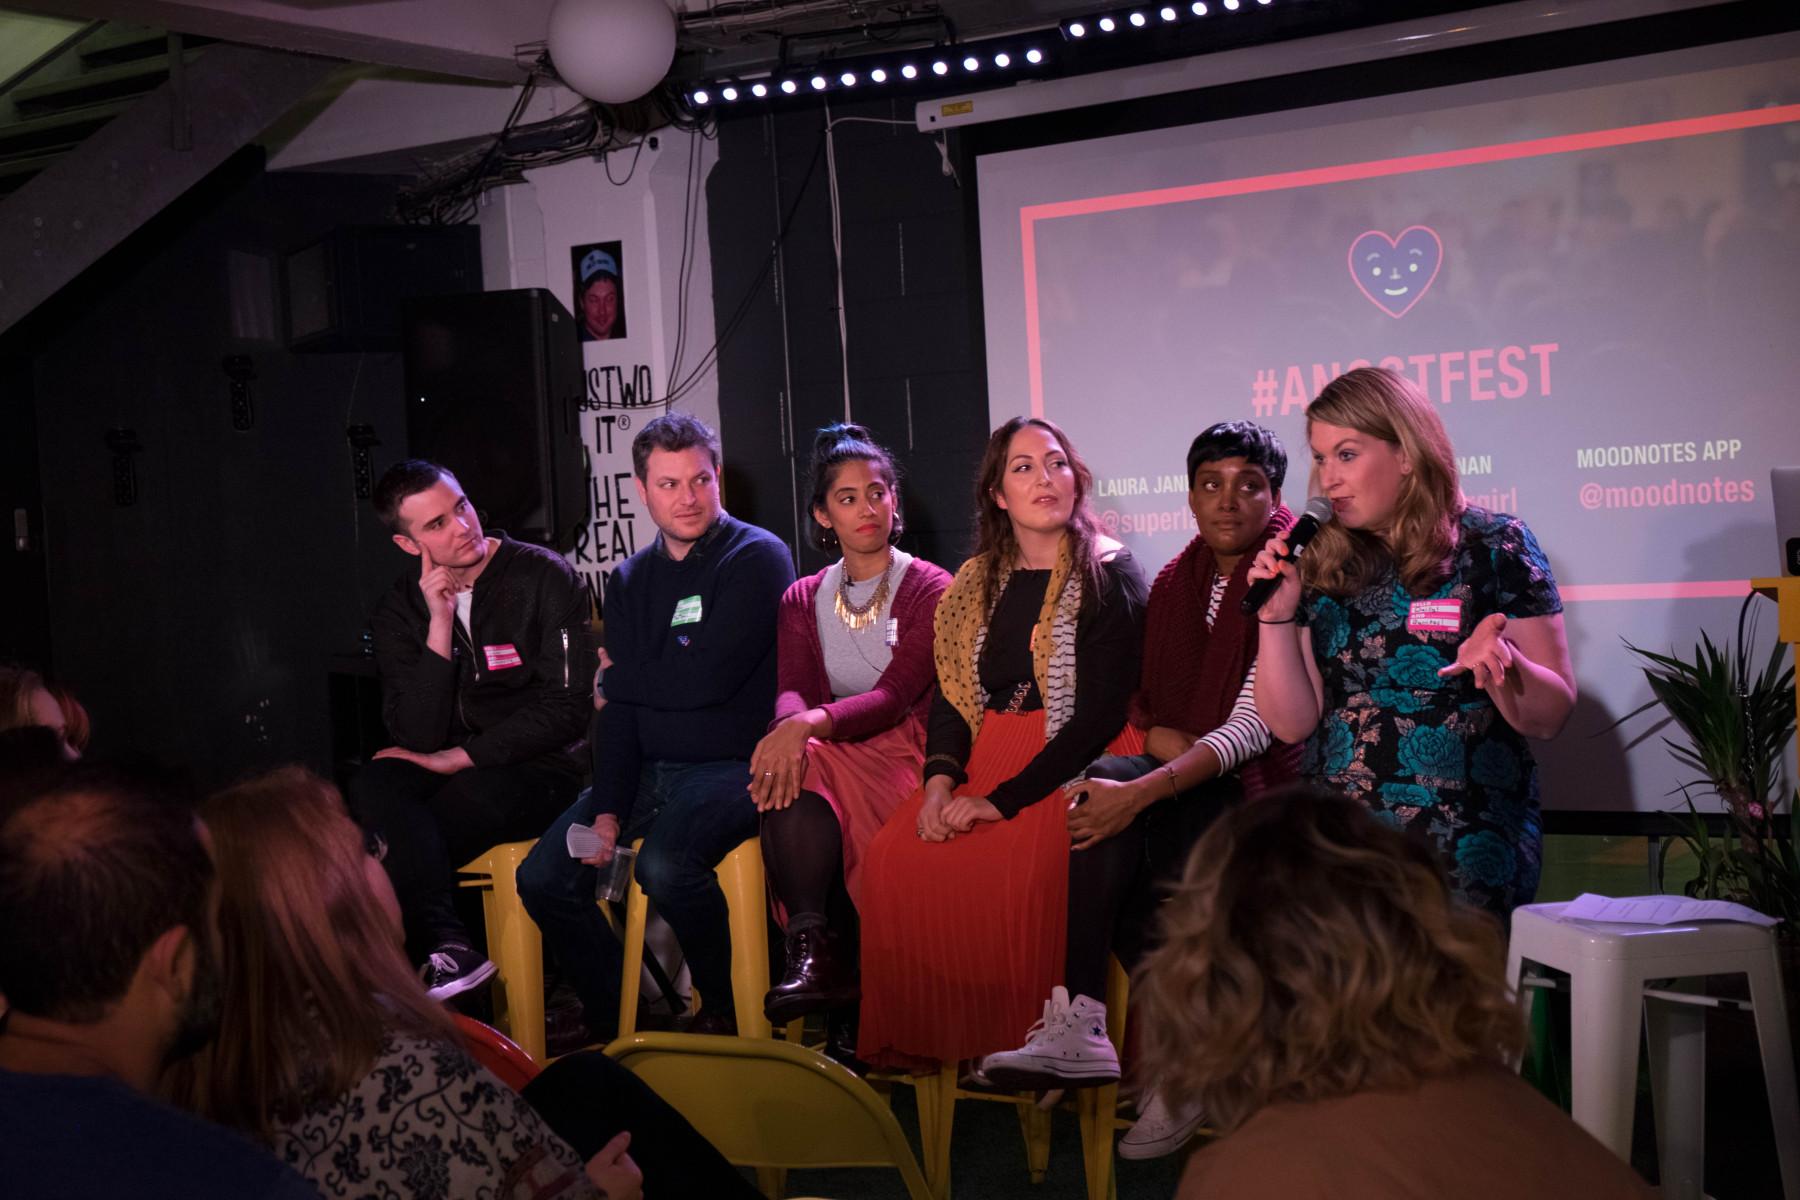 #Angstfest panel (Left to Right:Calum McSwiggan,Joel Beckman, Roshni Goyate, Amiera Sawas,Anni Ferguson and Daisy Buchanan).